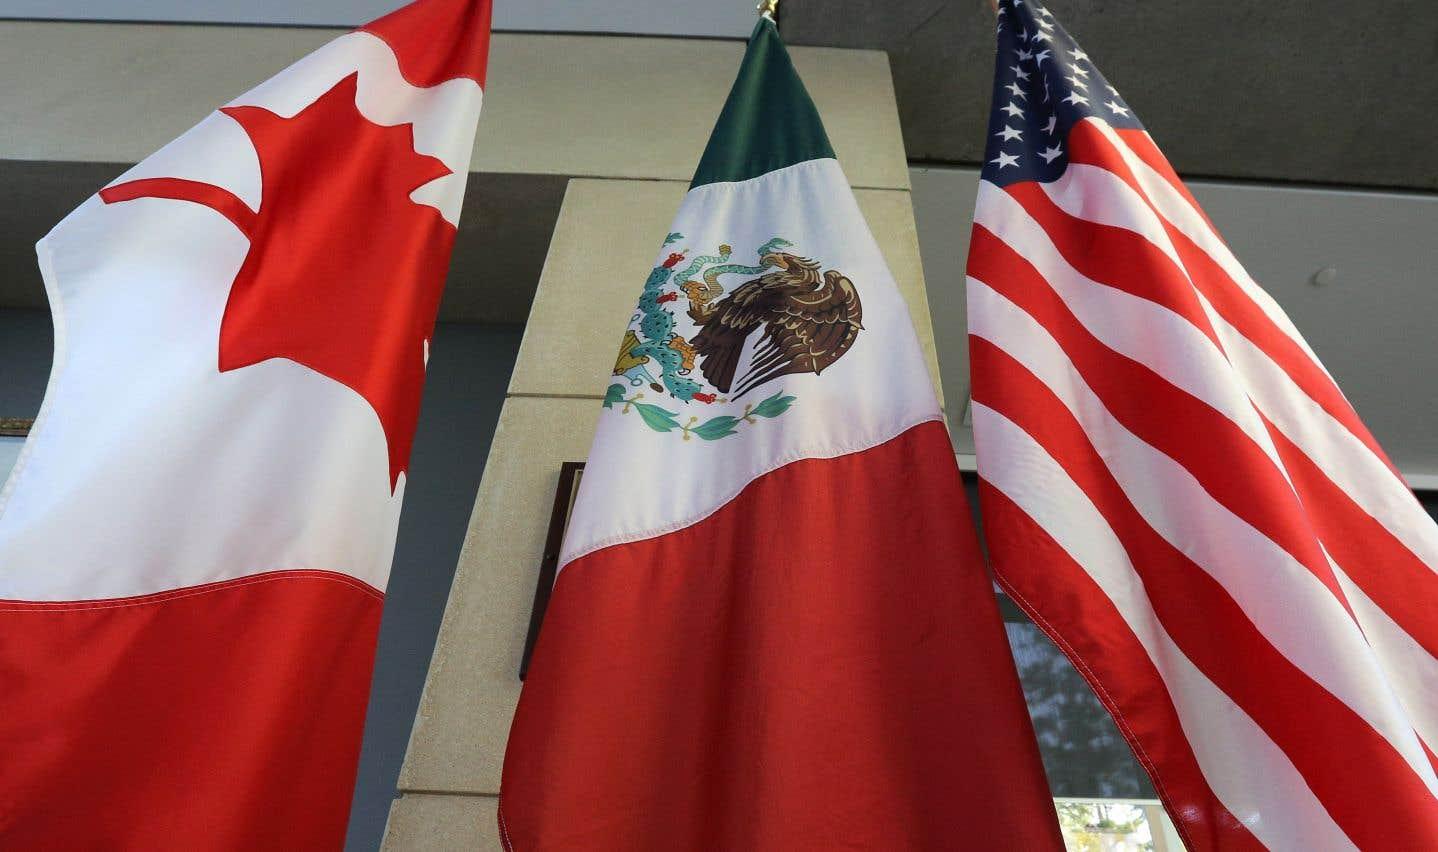 ALENA: un vent d'optimisme souffle à la table des négociations